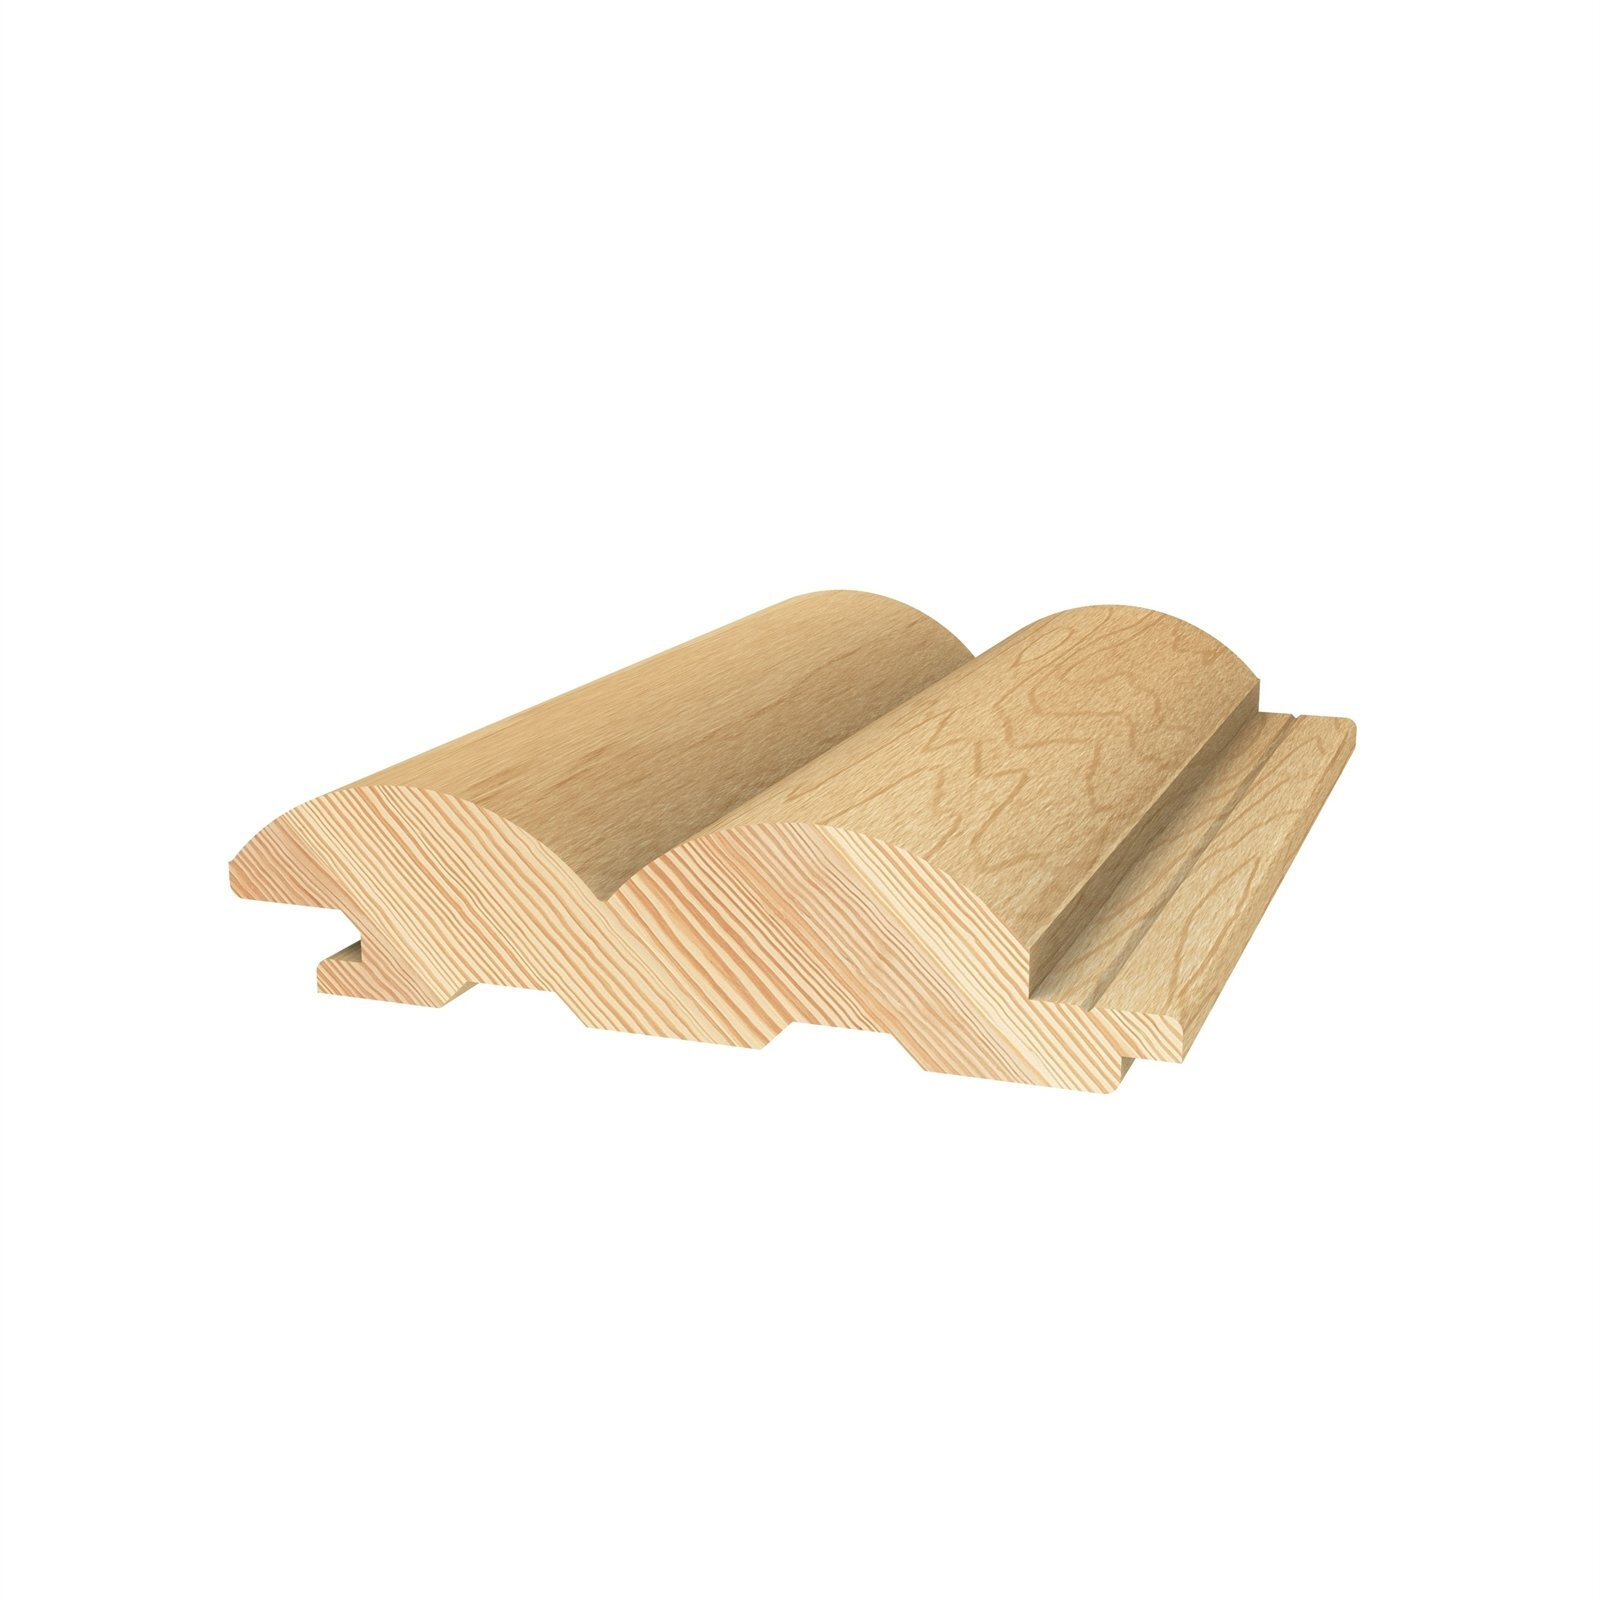 Porta Contours 78 x 21mm 2.4m Riverine Clear Pine Lining Board